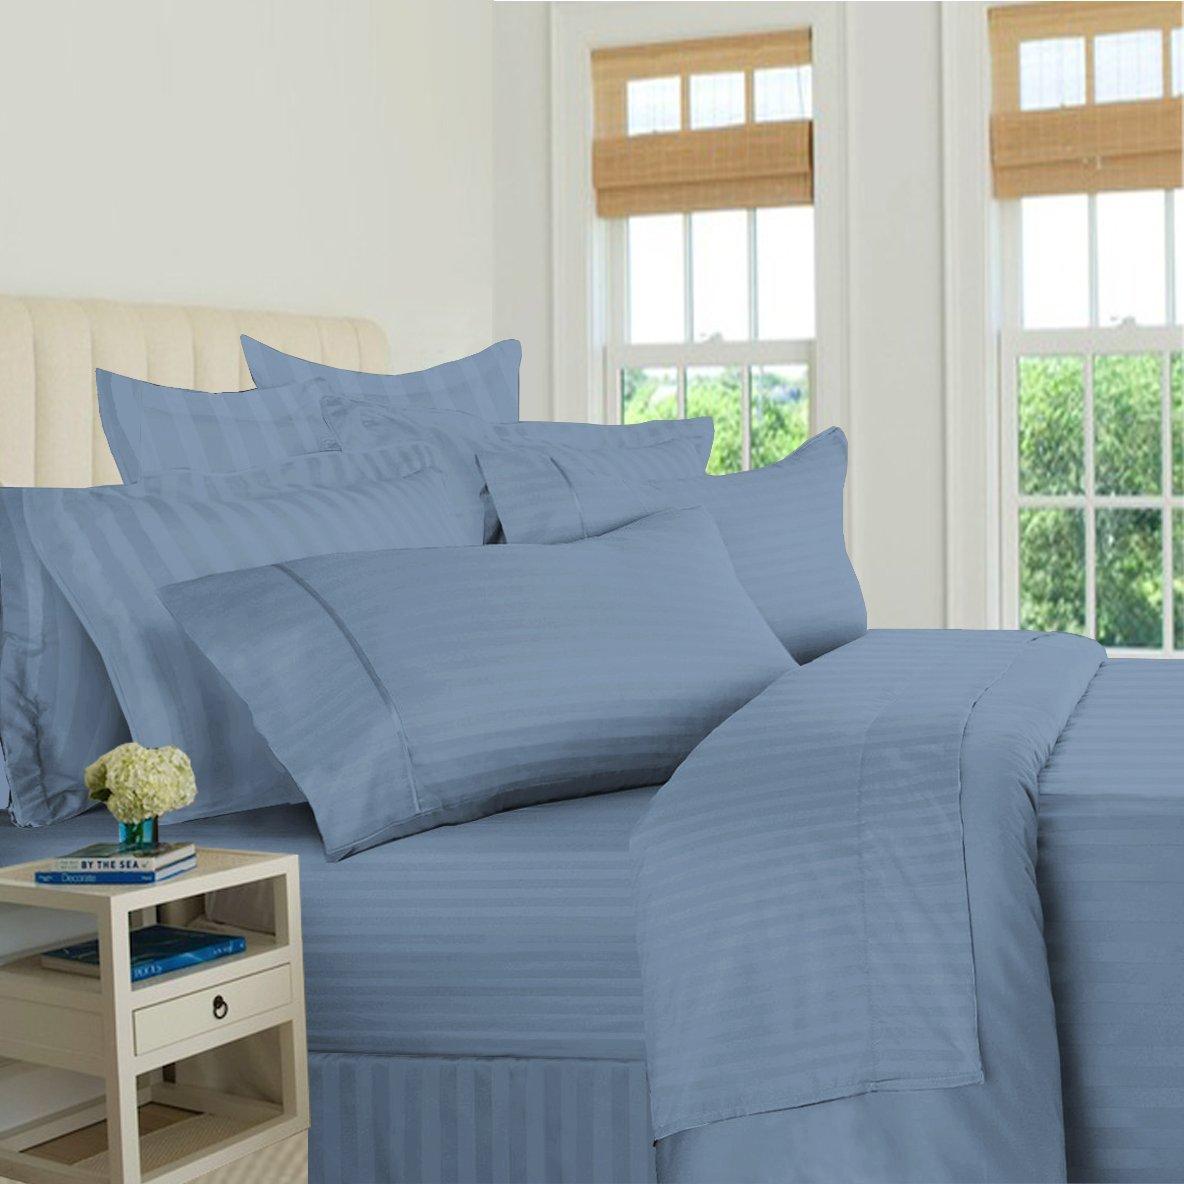 amazon com bed bath fashions fifth ave luxury 500 thread count 100